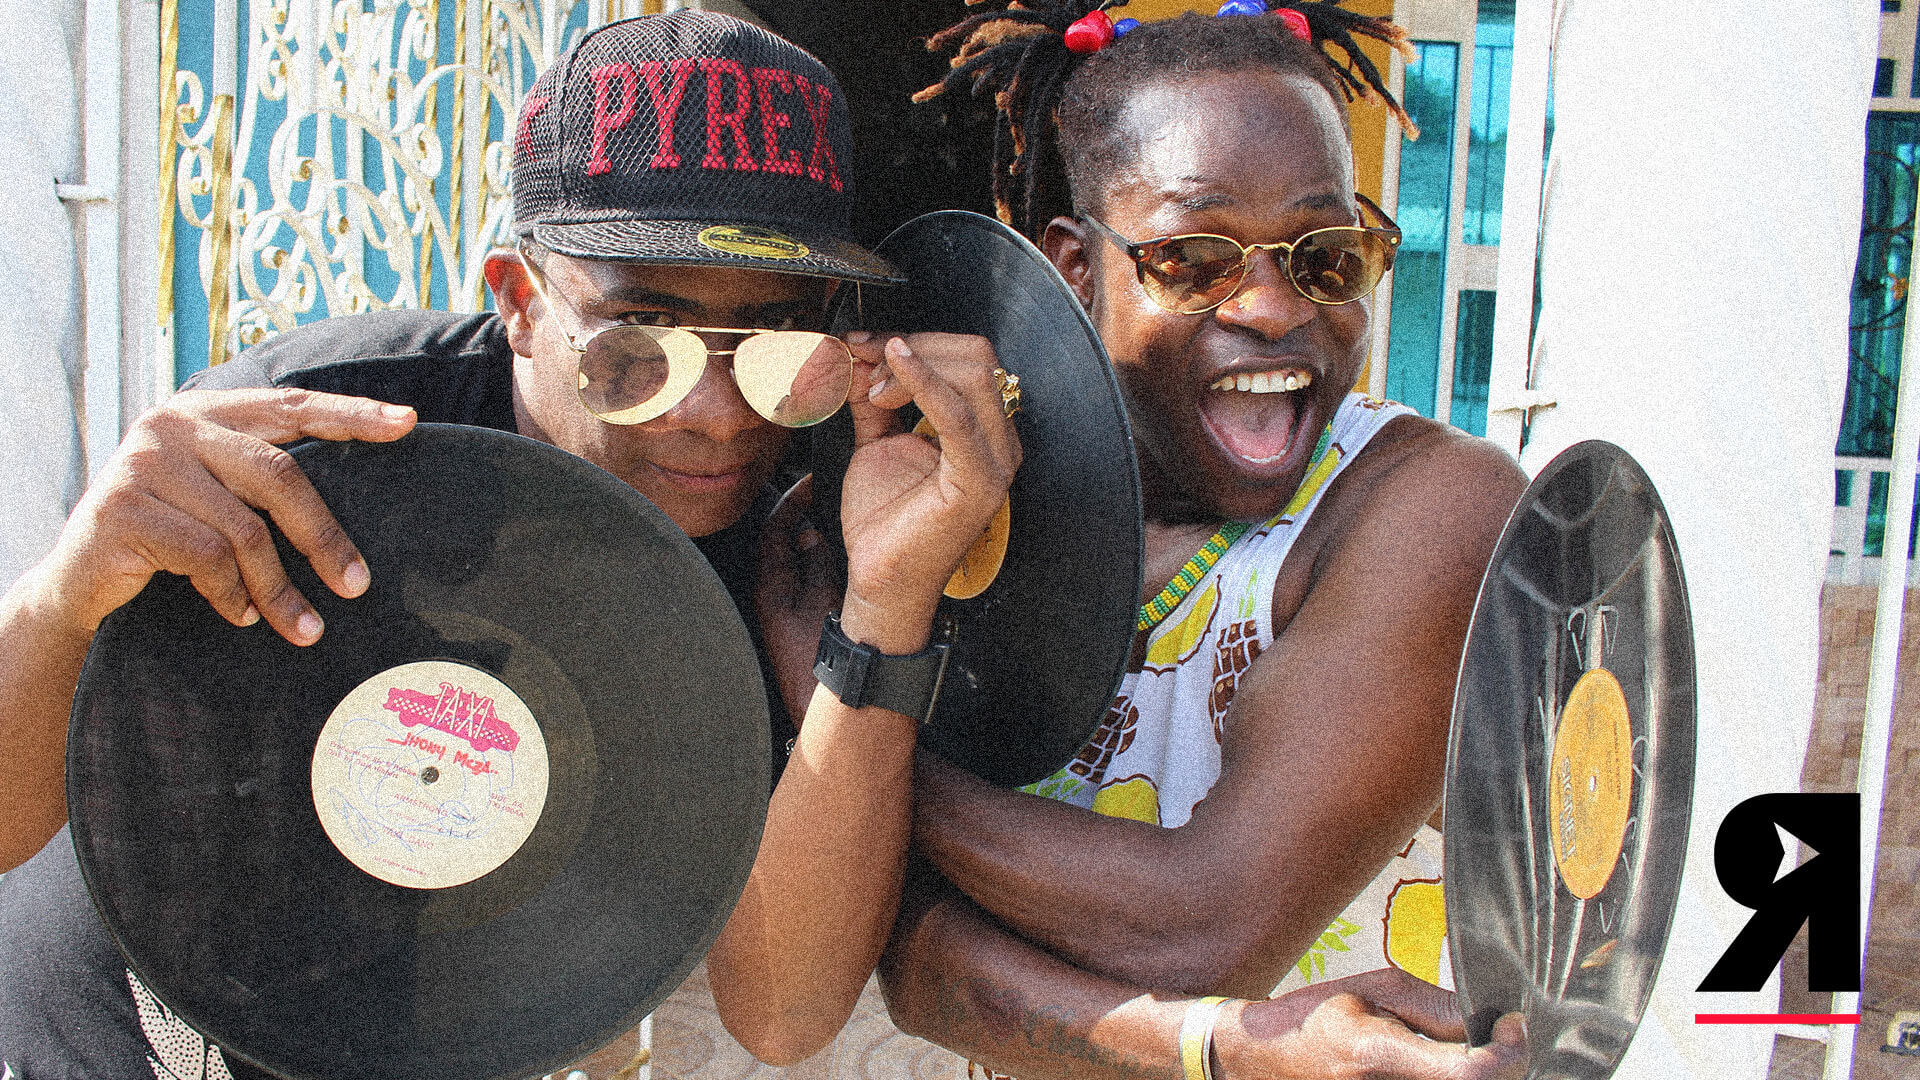 ¡Pacifista! presenta: 'Dancehall a prueba de balas'